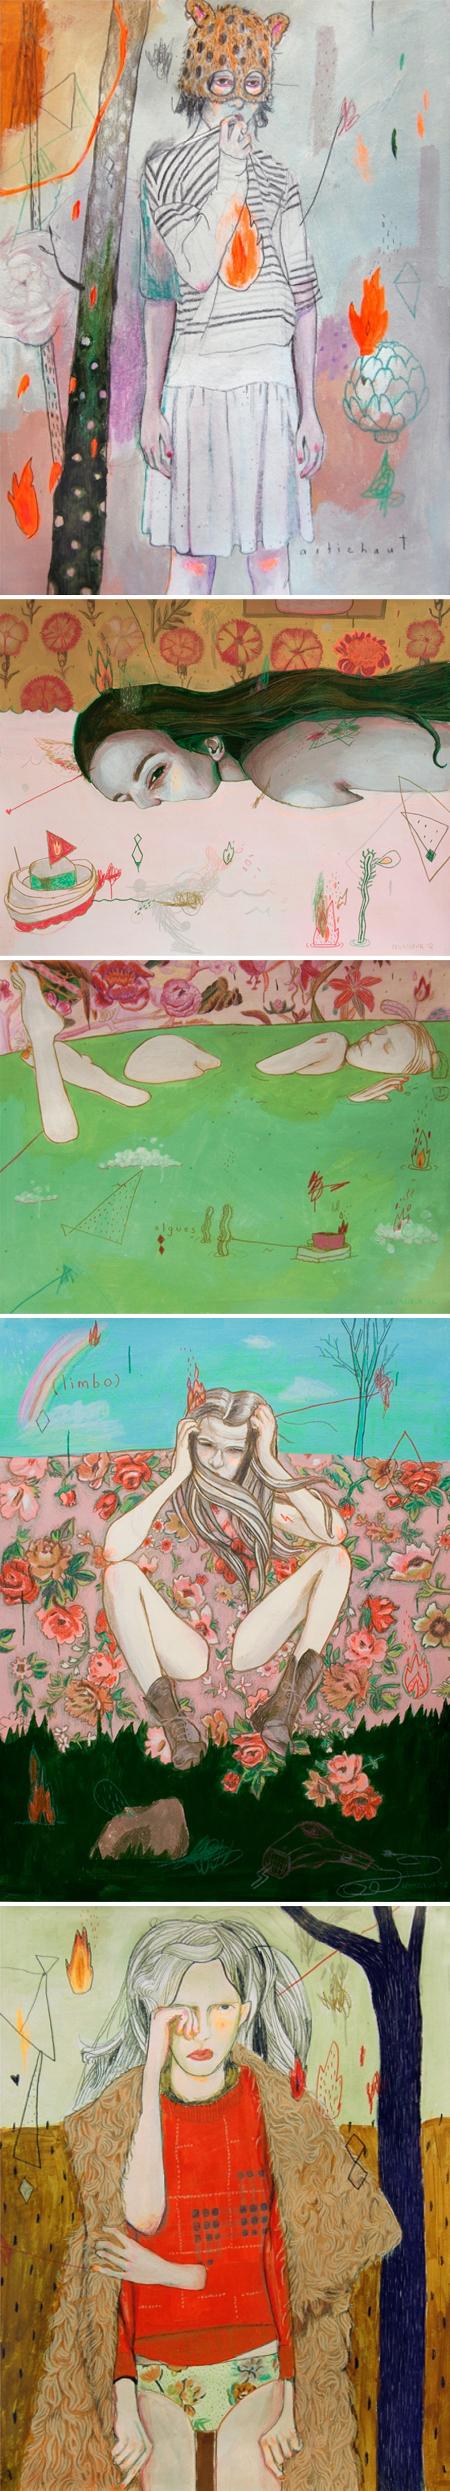 curated contemporary art /// i'm jealous of alexandra levasseur